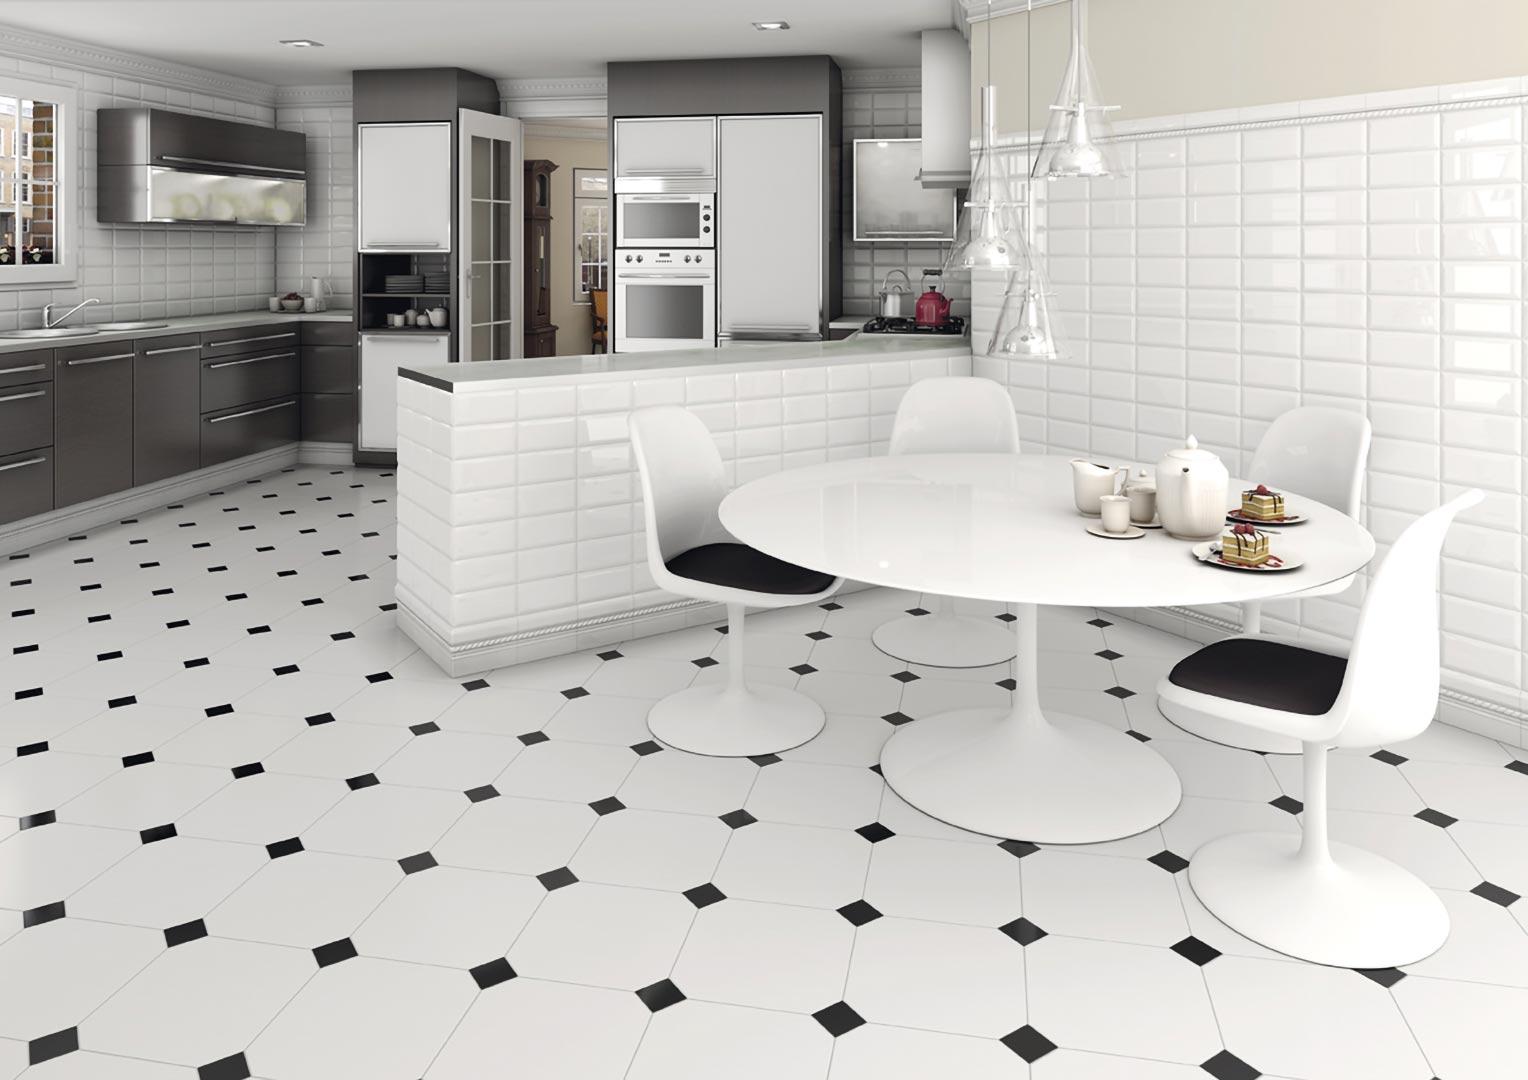 Vives floor tiles gres monocolor 20x20 floor tiles gres bb iso 13006 h dailygadgetfo Images